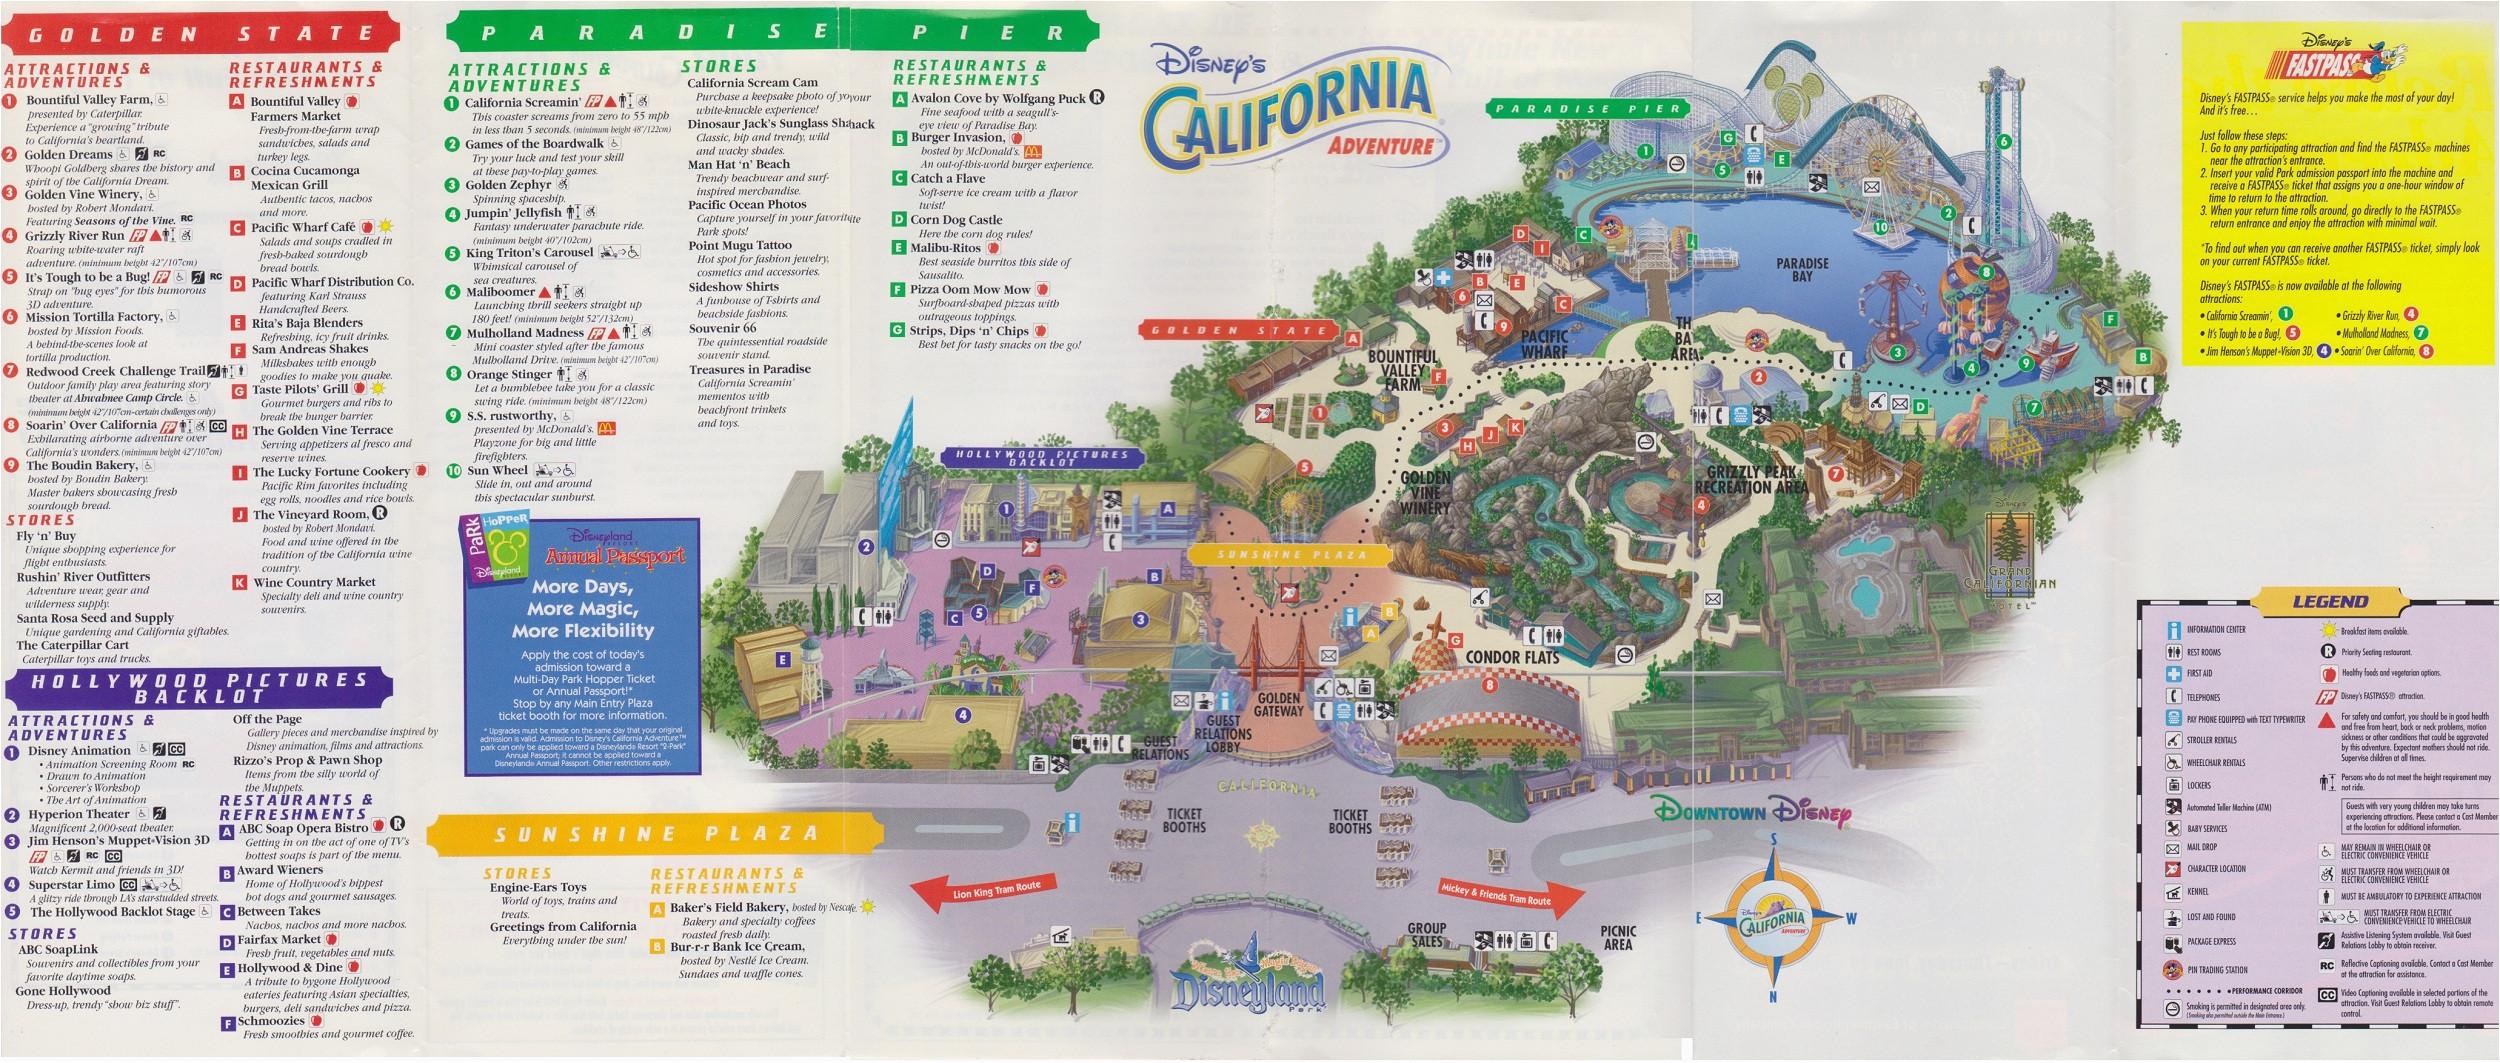 graphic relating to Disney Printable Maps called Disney California Experience Map Pdf secretmuseum